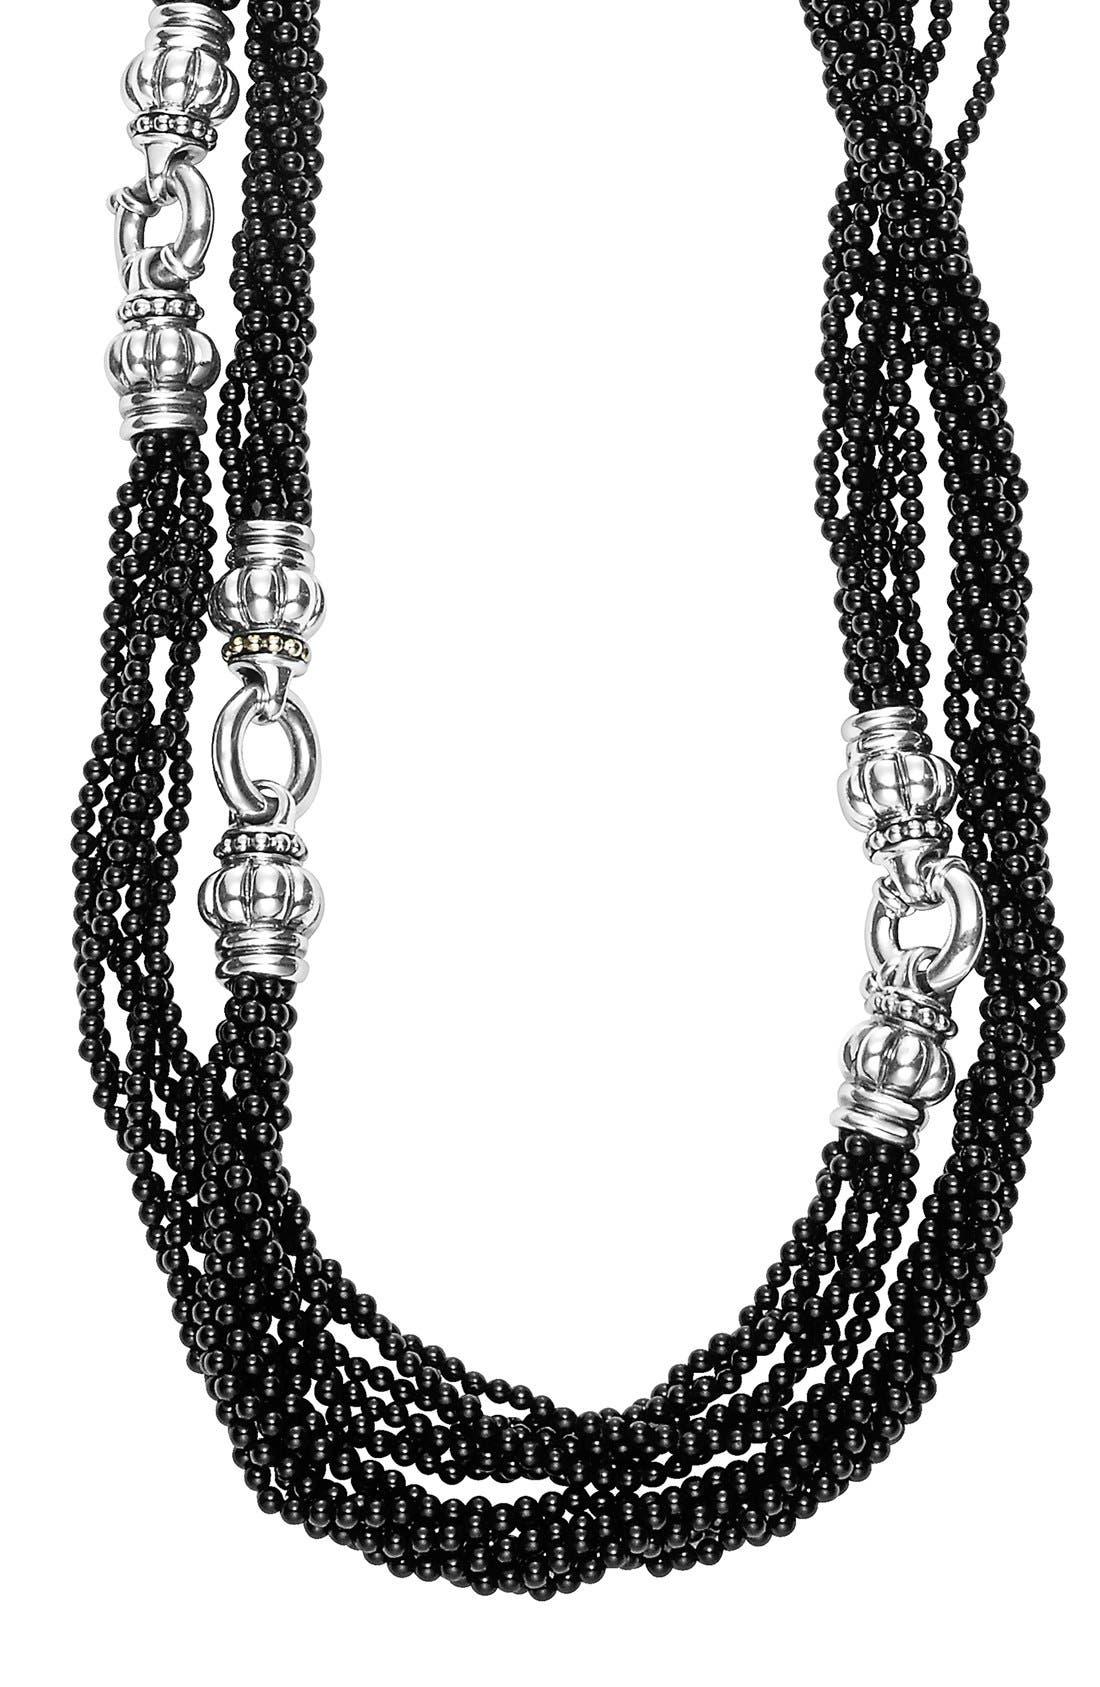 'Black Caviar' Beaded Necklace,                             Alternate thumbnail 2, color,                             Black Caviar/ Silver